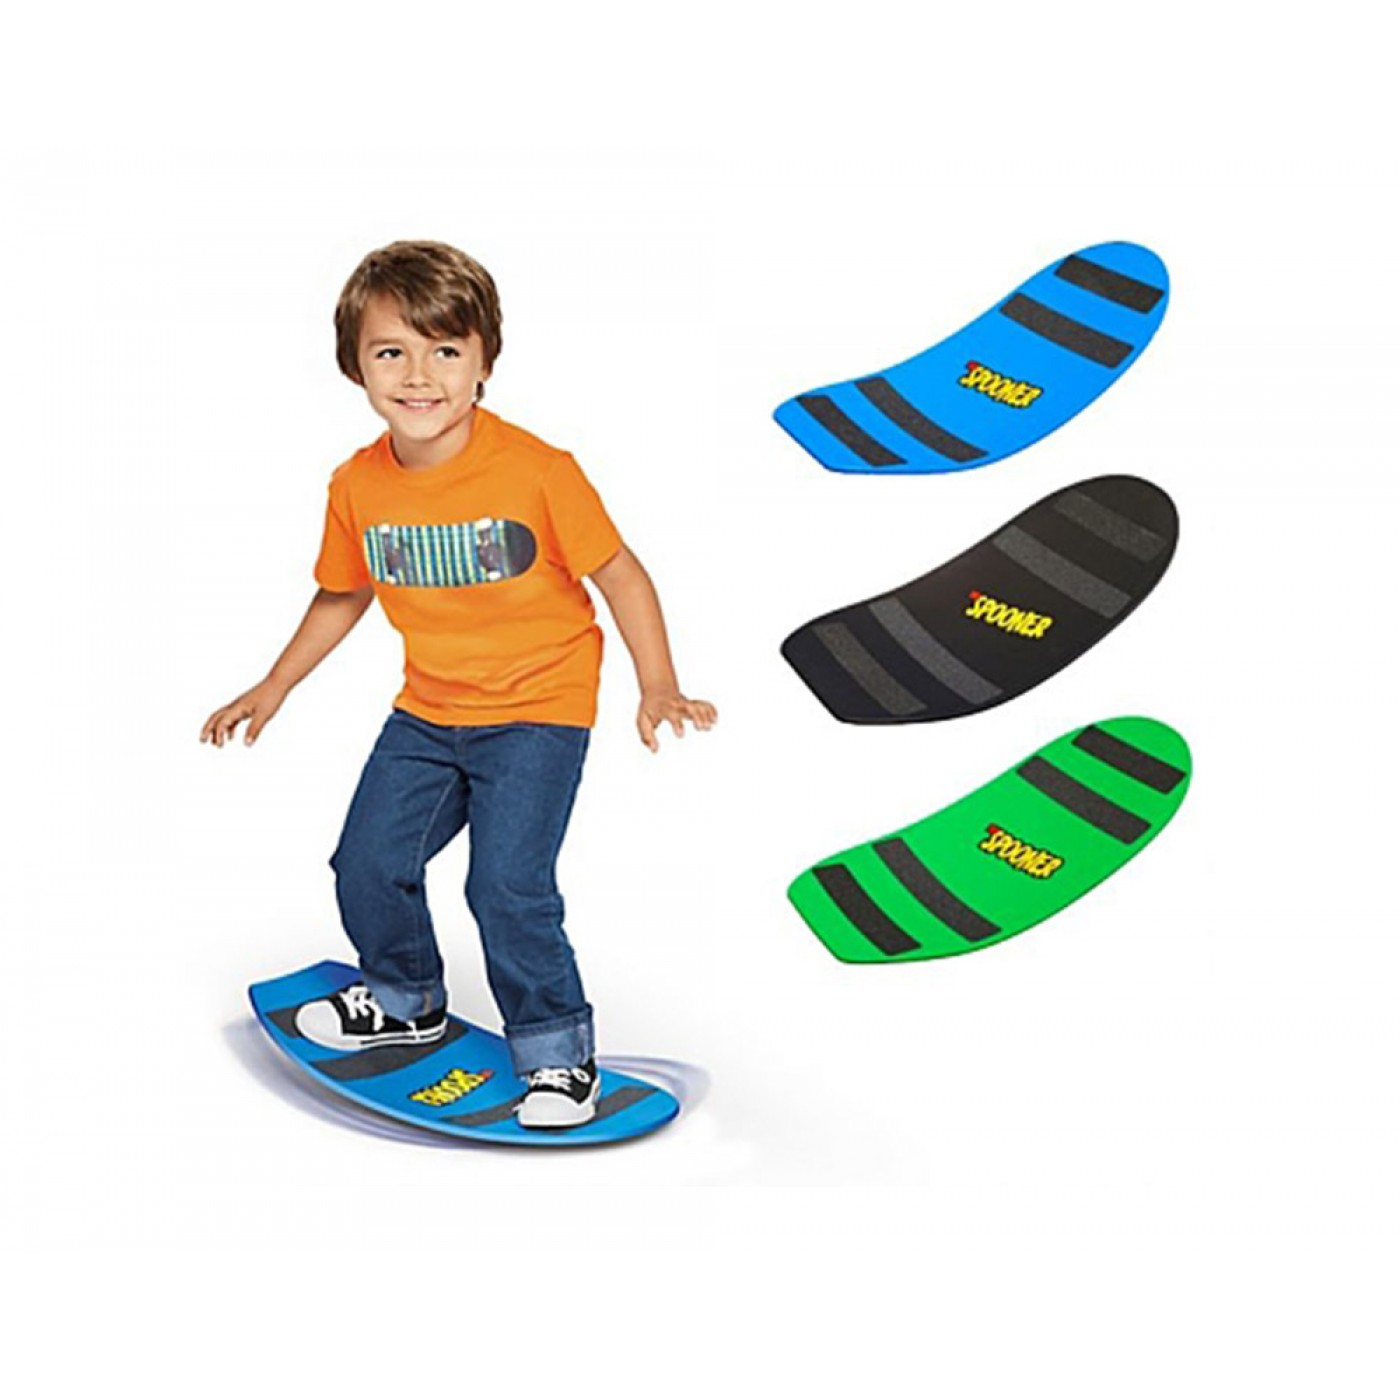 Spooner Board - Pro 25.5 inch